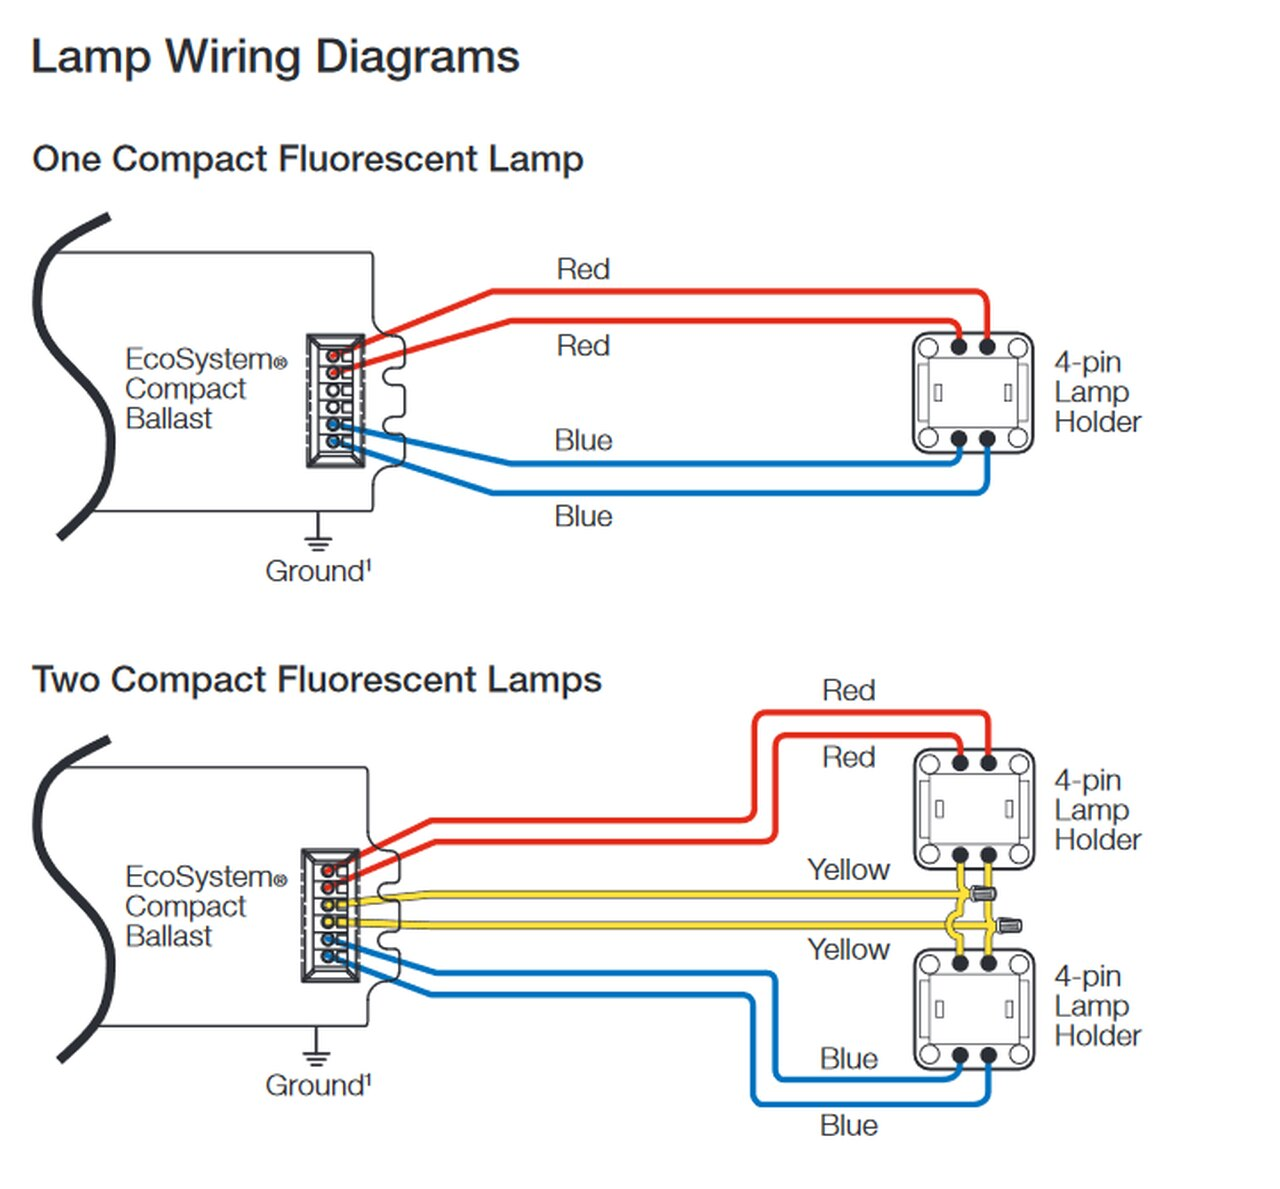 cc_1320] 4 pin compact fluorescent wiring diagram free diagram  hete ical gram botse itis viewor mohammedshrine librar wiring 101